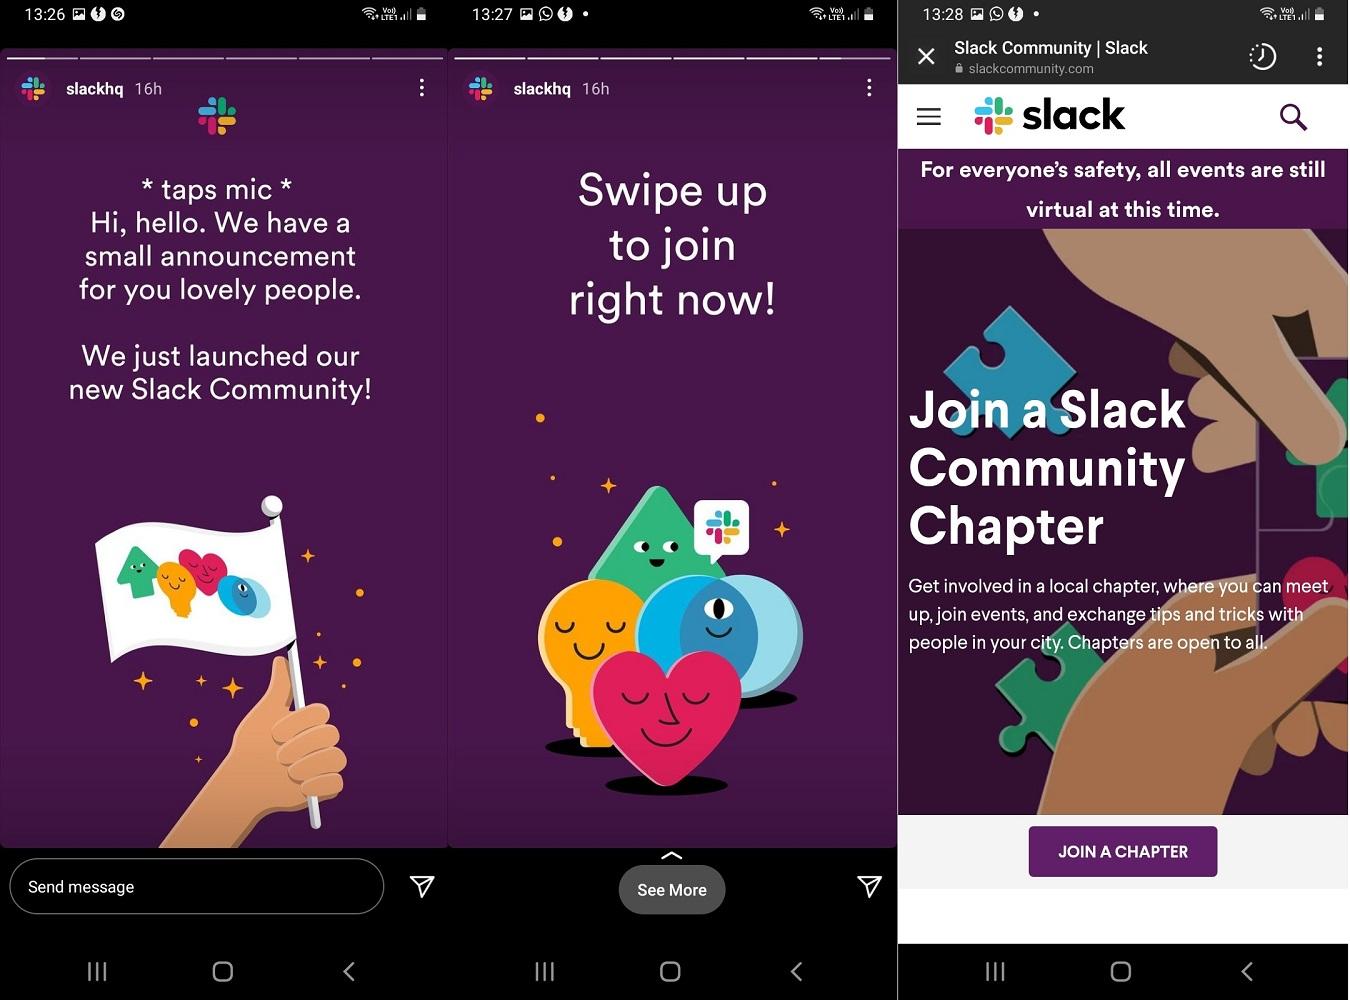 Slack Community